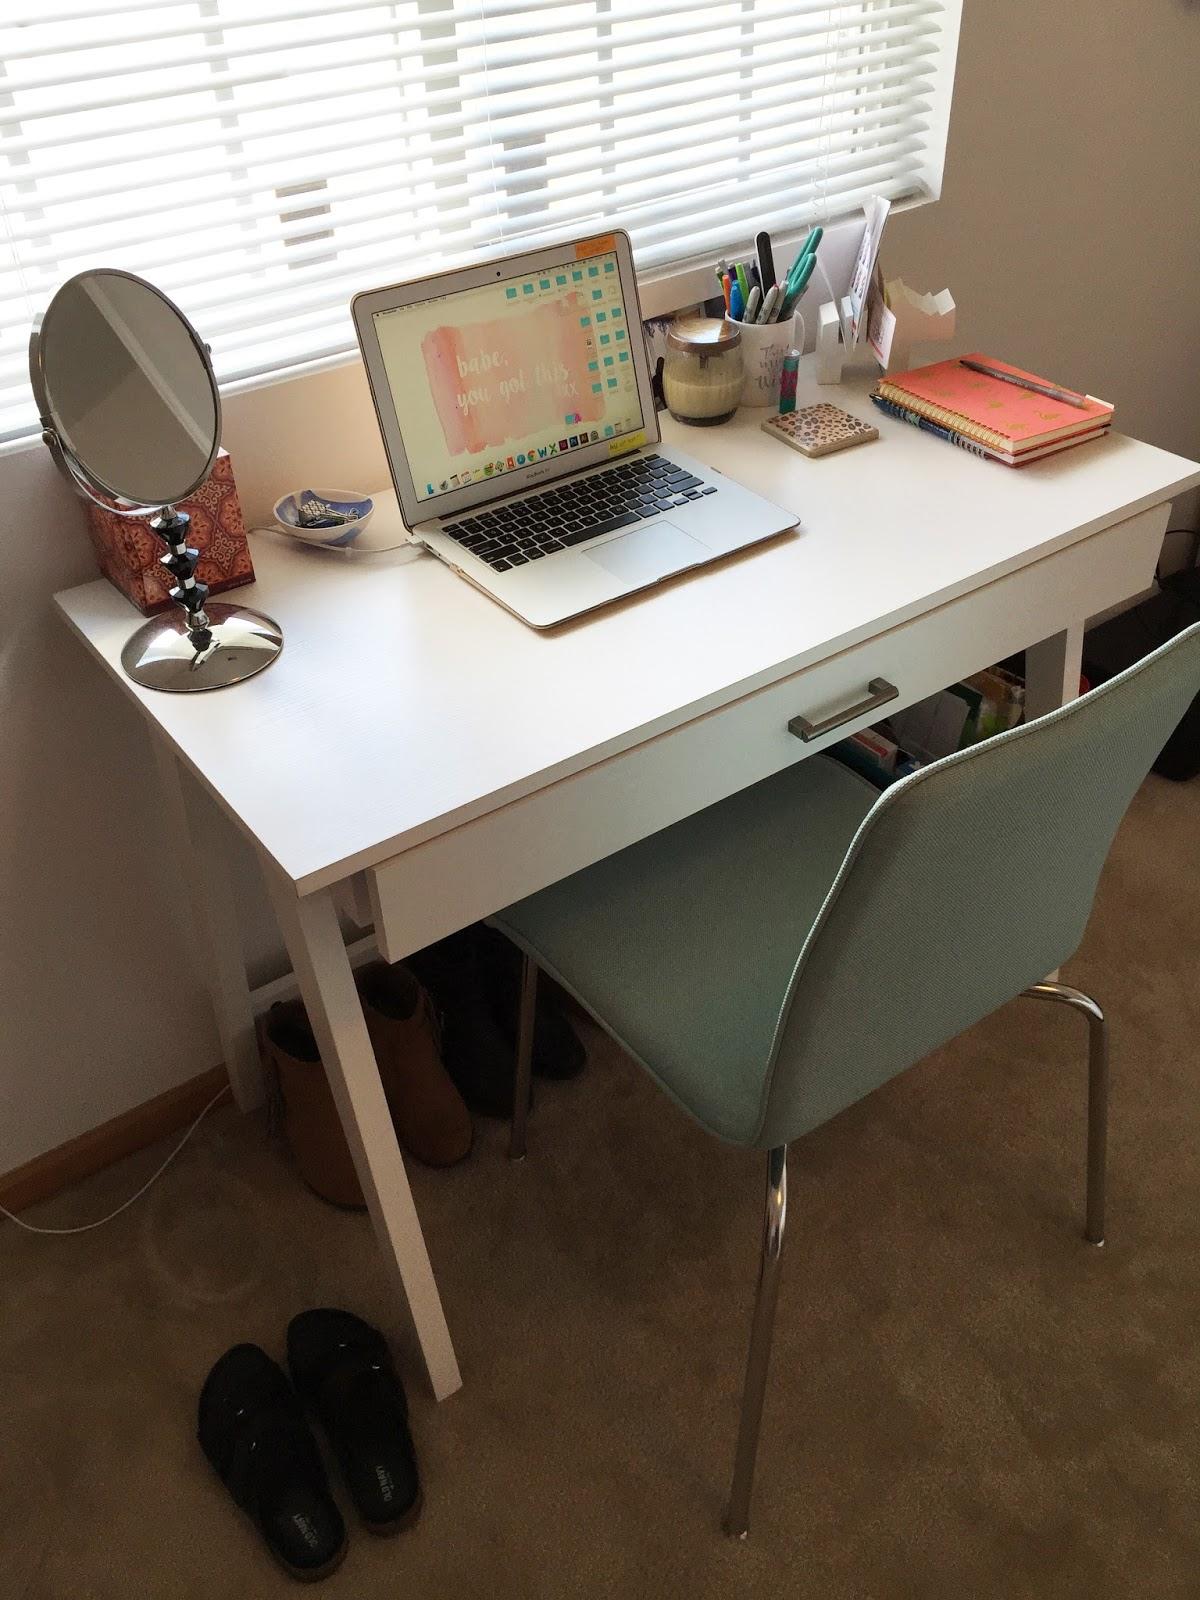 3x3 Shelf / White Desk / Necklace / Bust / Purple Dish From HomeGoods /  Ring Dish / Tassel Earrings / Coffee Mug / Audrey Hepburn Book / Lamp /  Contact ...